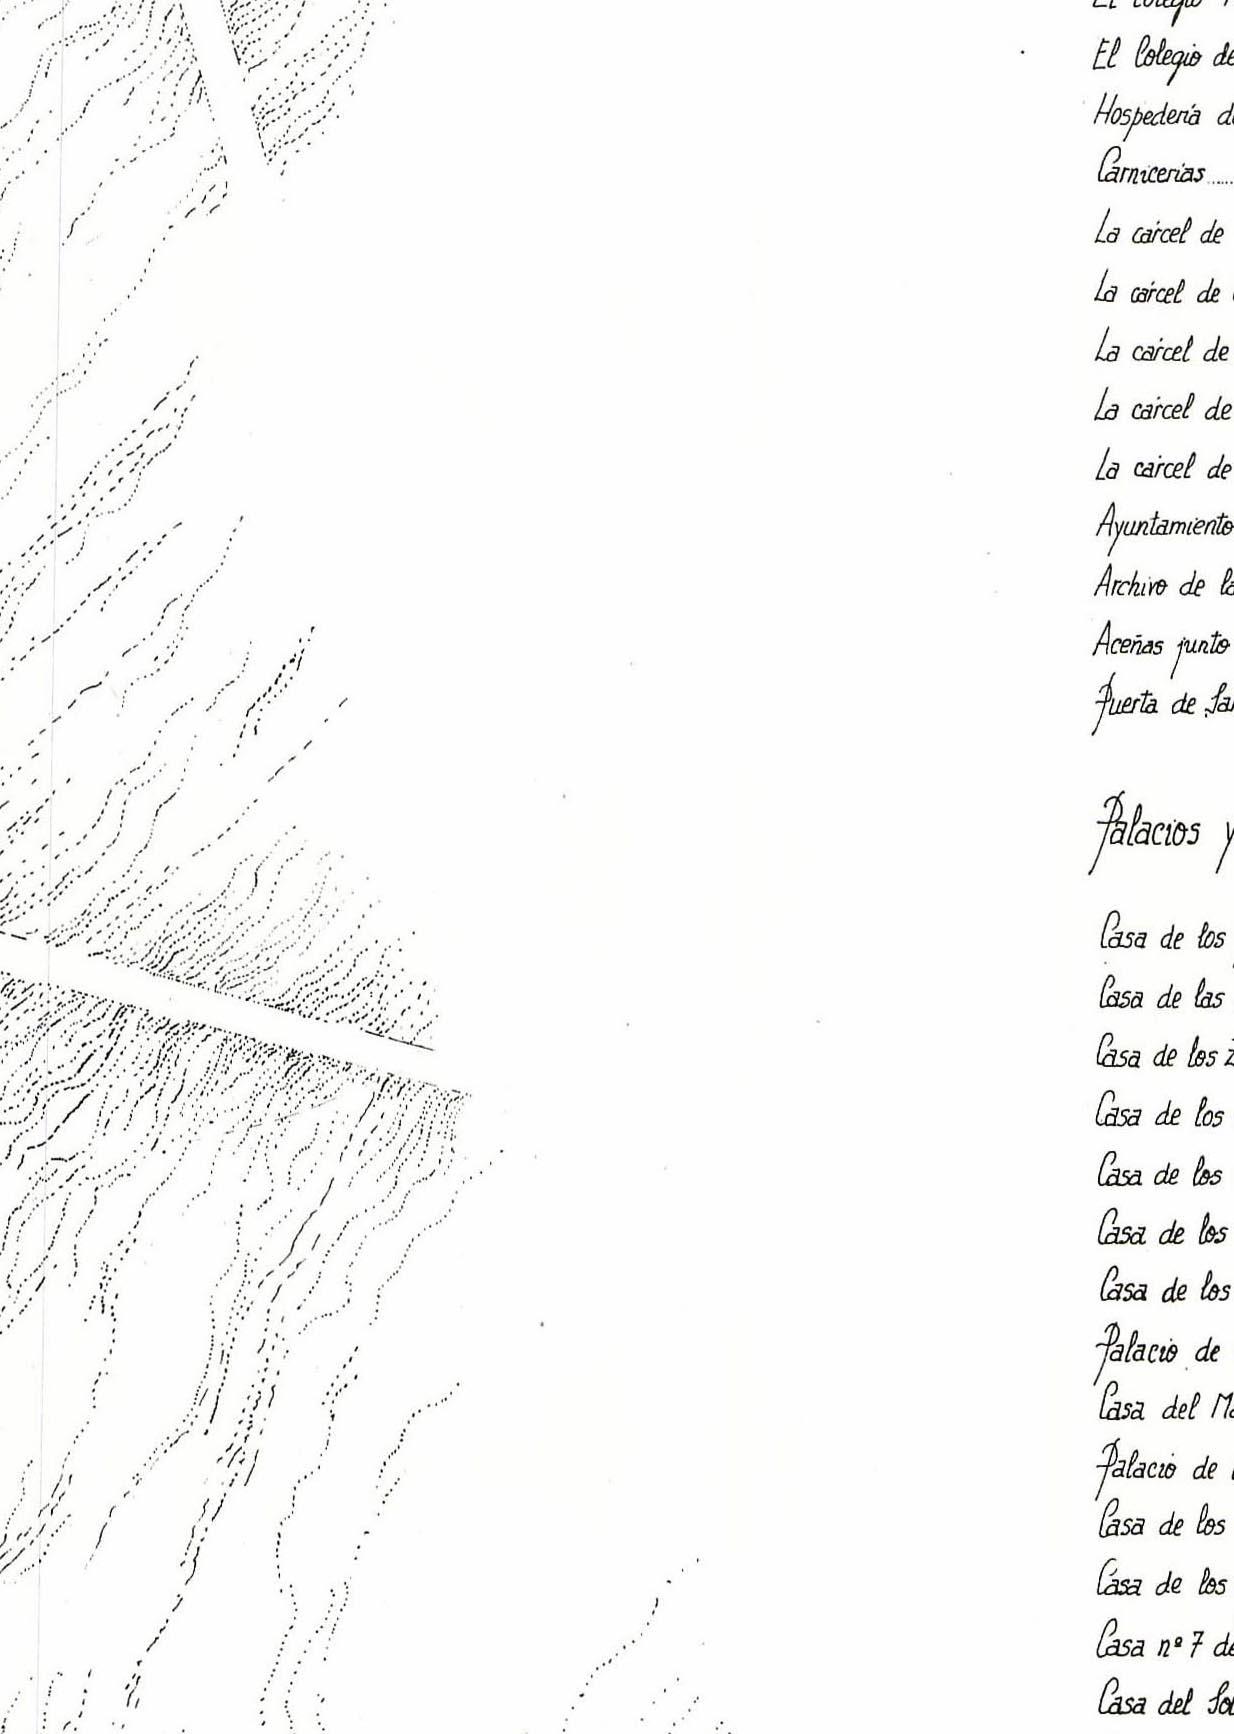 danielvillalobos-valladolid-blueprints-renaissance-g.9